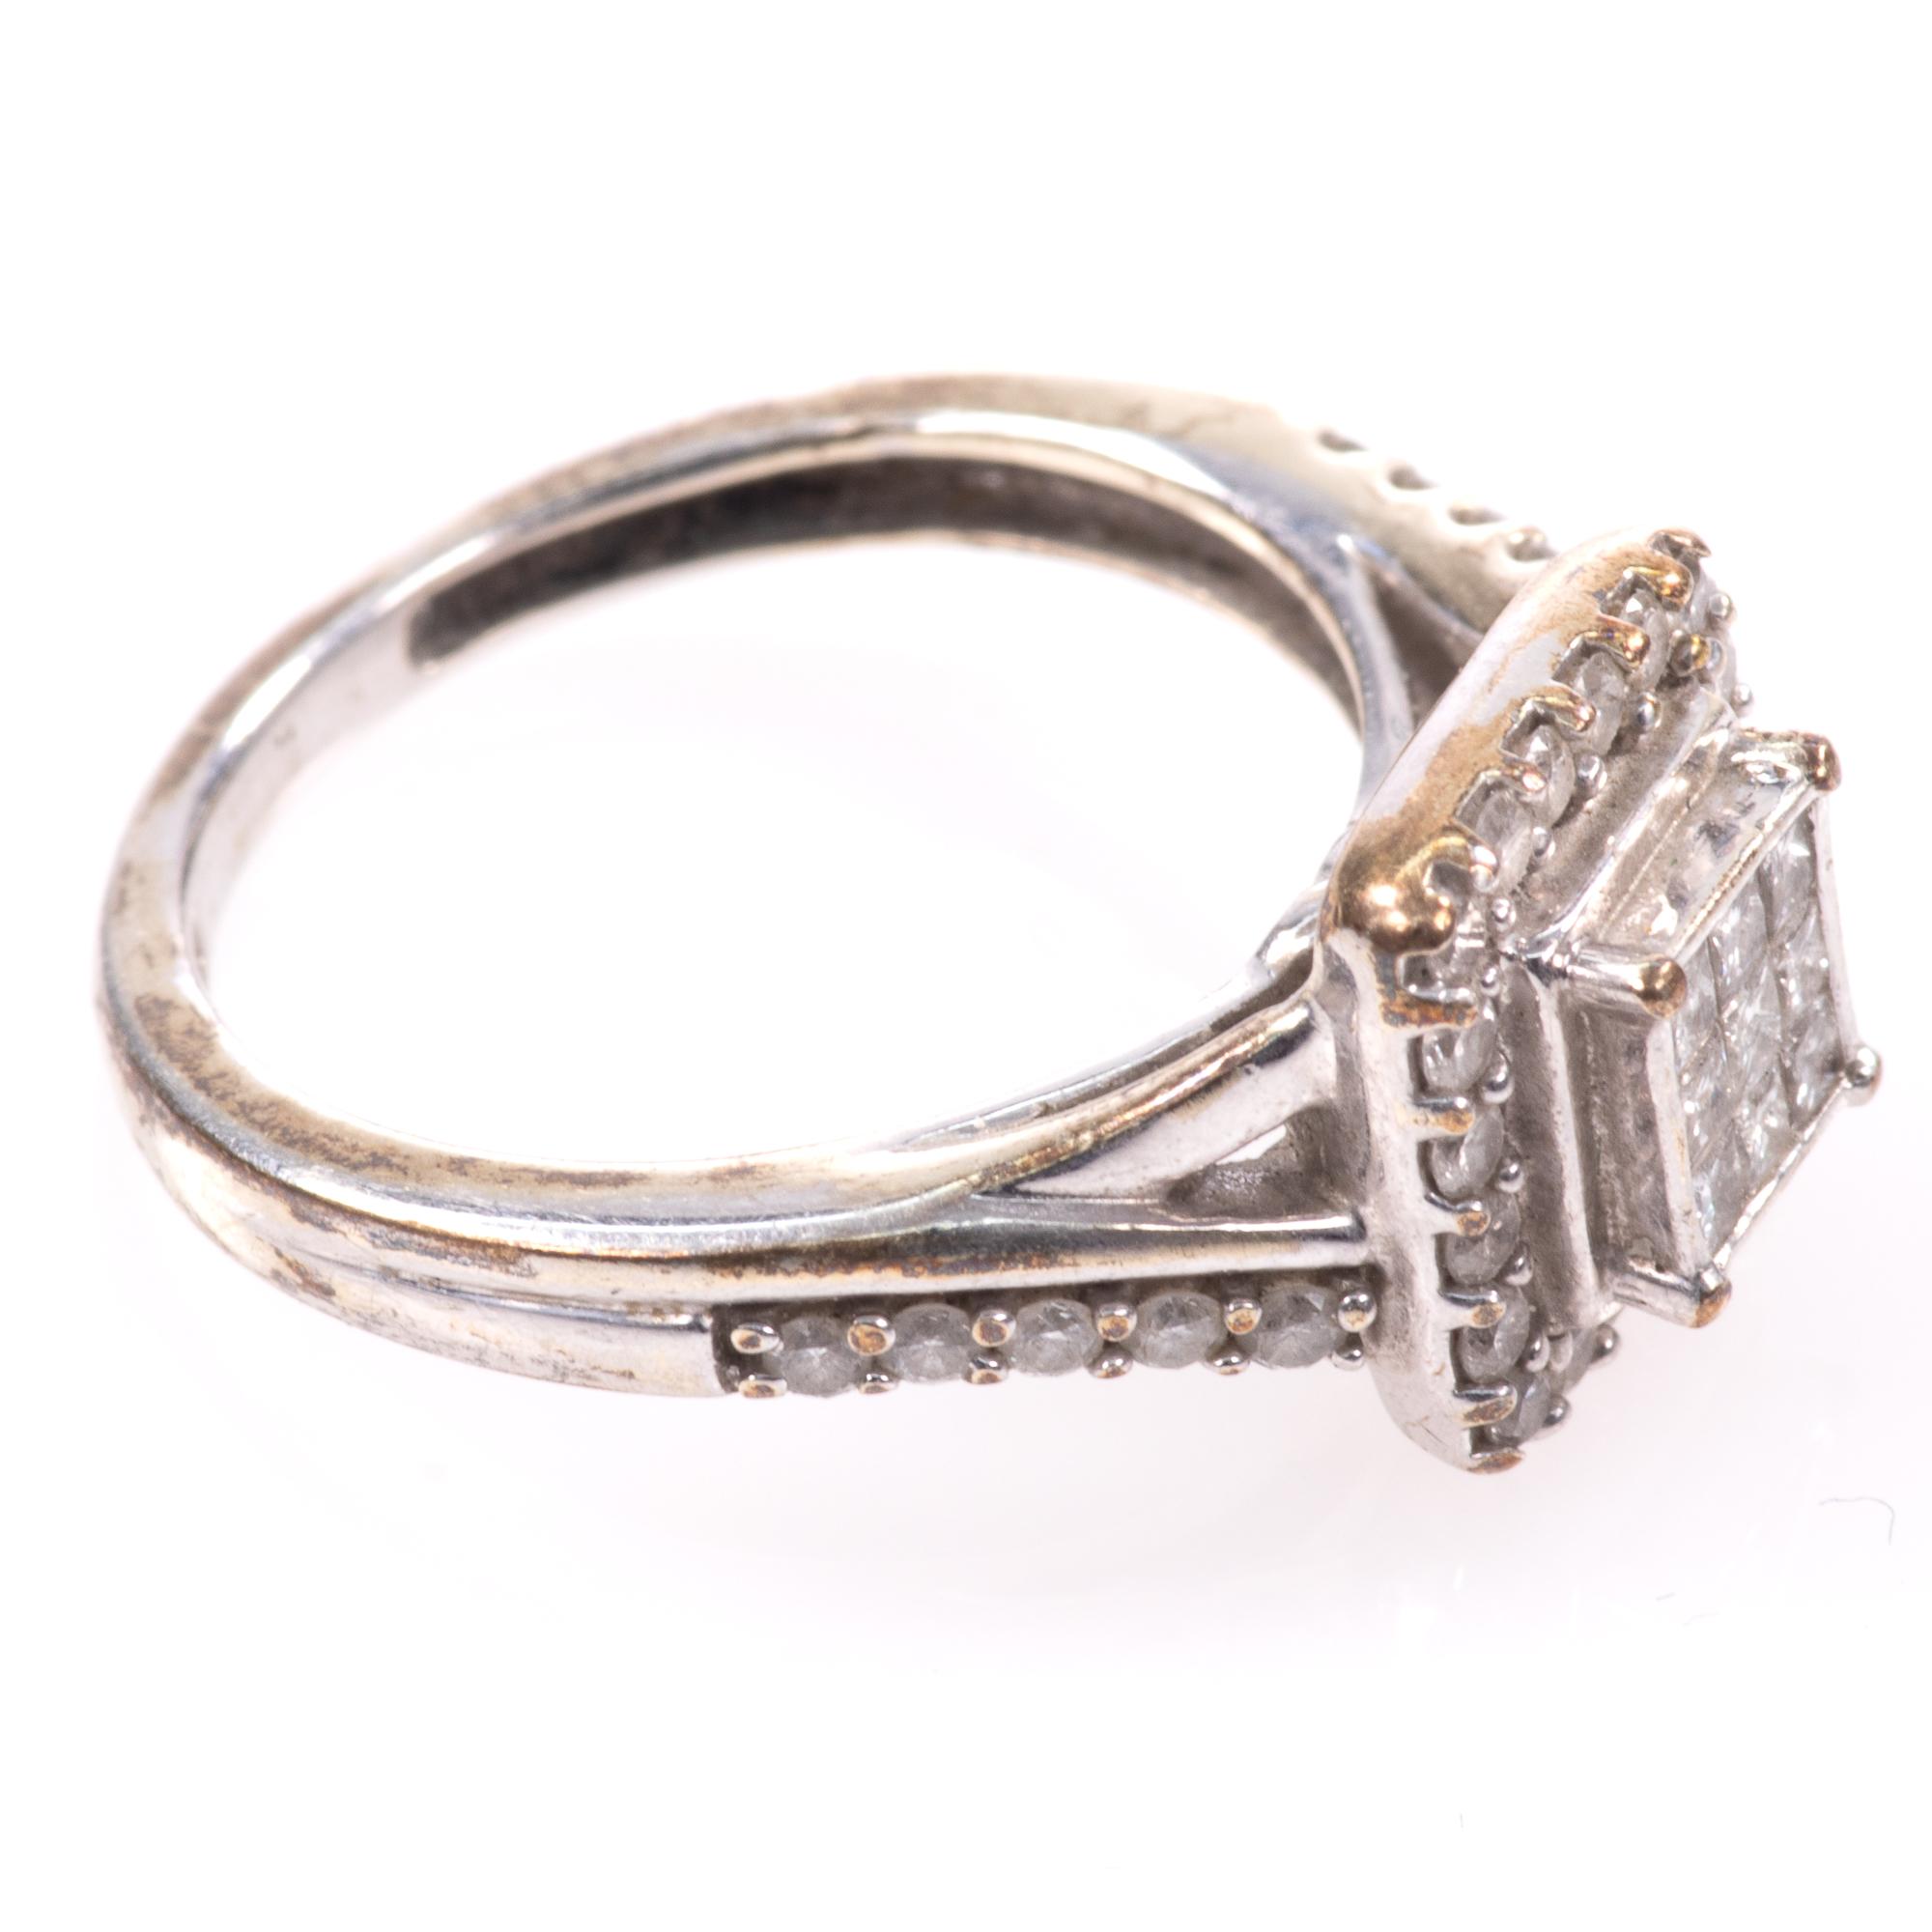 9ct White Gold 0.40ct Diamond Ring - Image 6 of 6